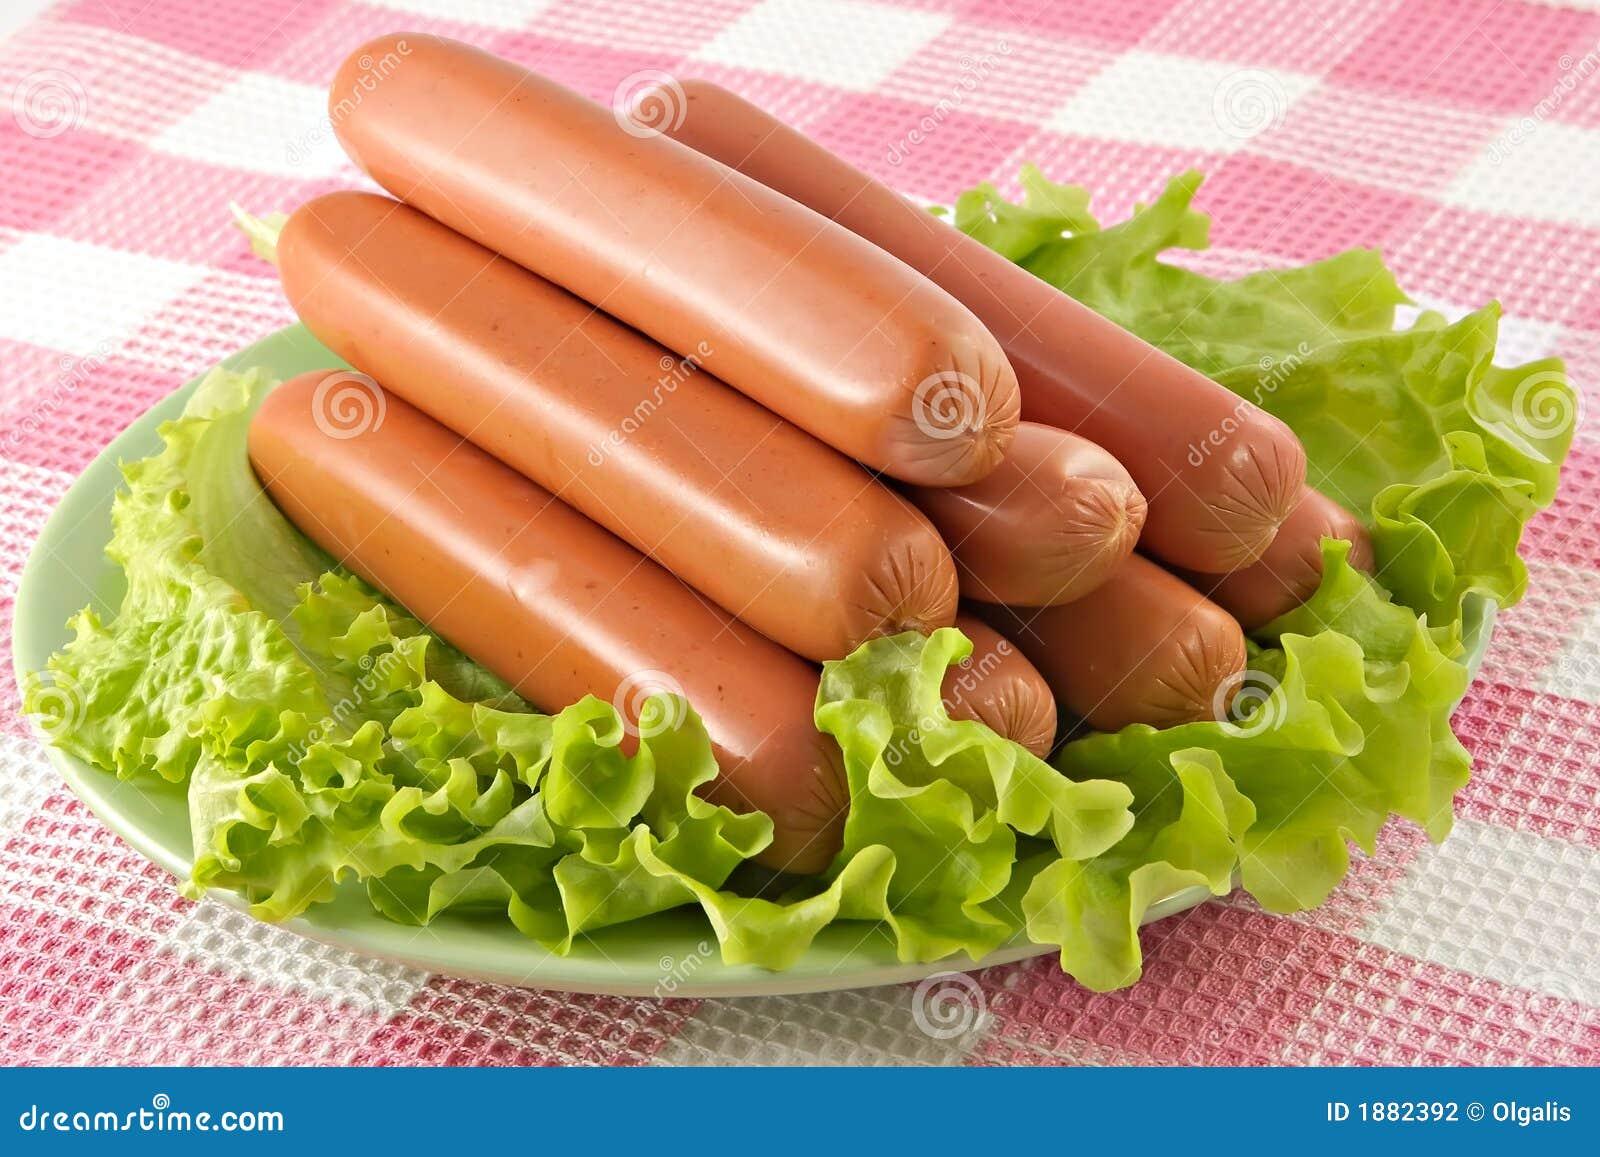 Appetizing pork sausages